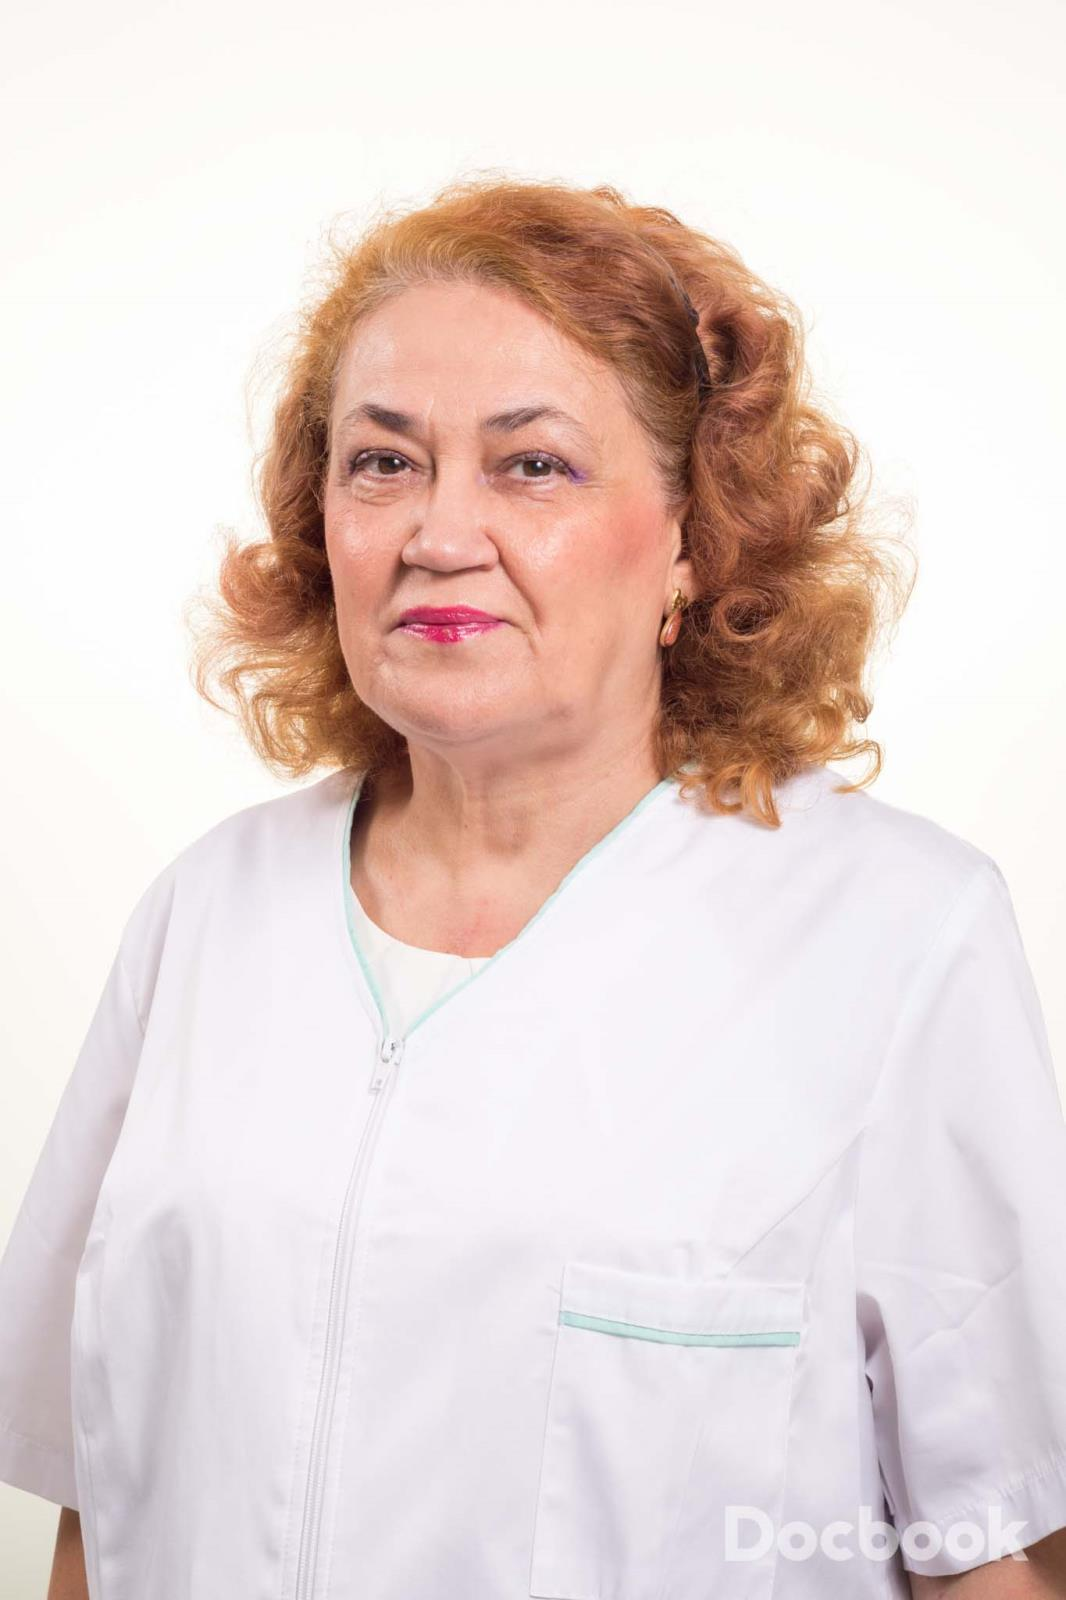 Dr. Jeana Spranceana